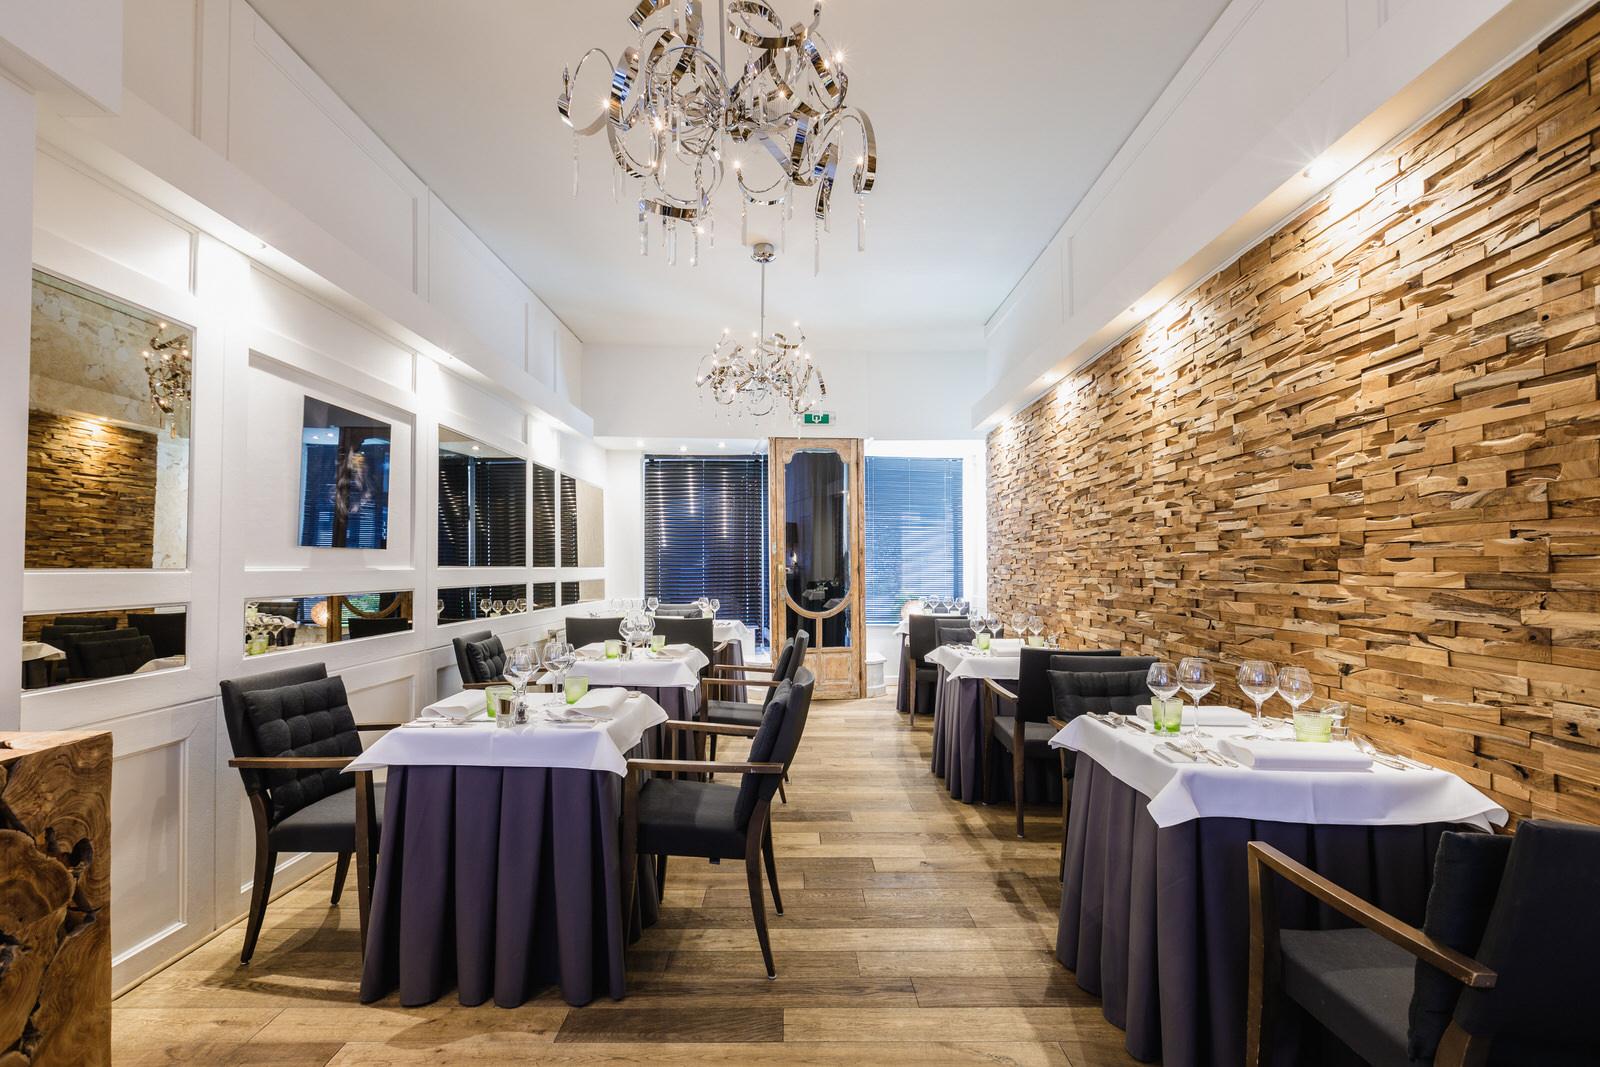 Romantic restaurants in Brussels